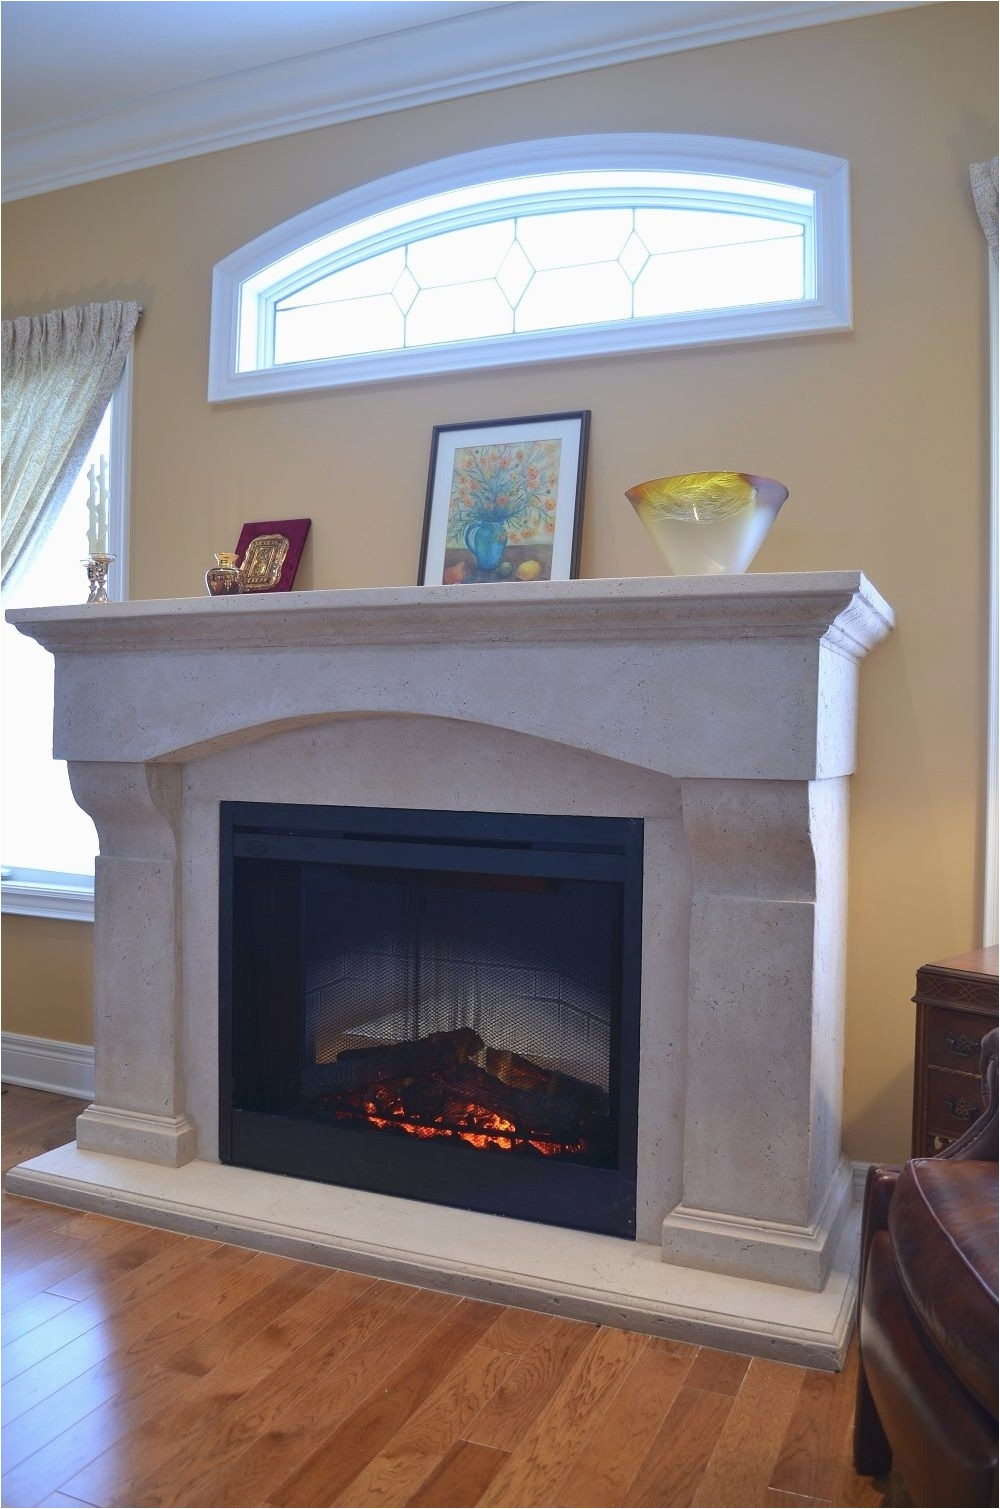 fireplace draft blocker tekno fresh electric fireplace inserts heartofafiercewoman of fireplace draft blocker tekno